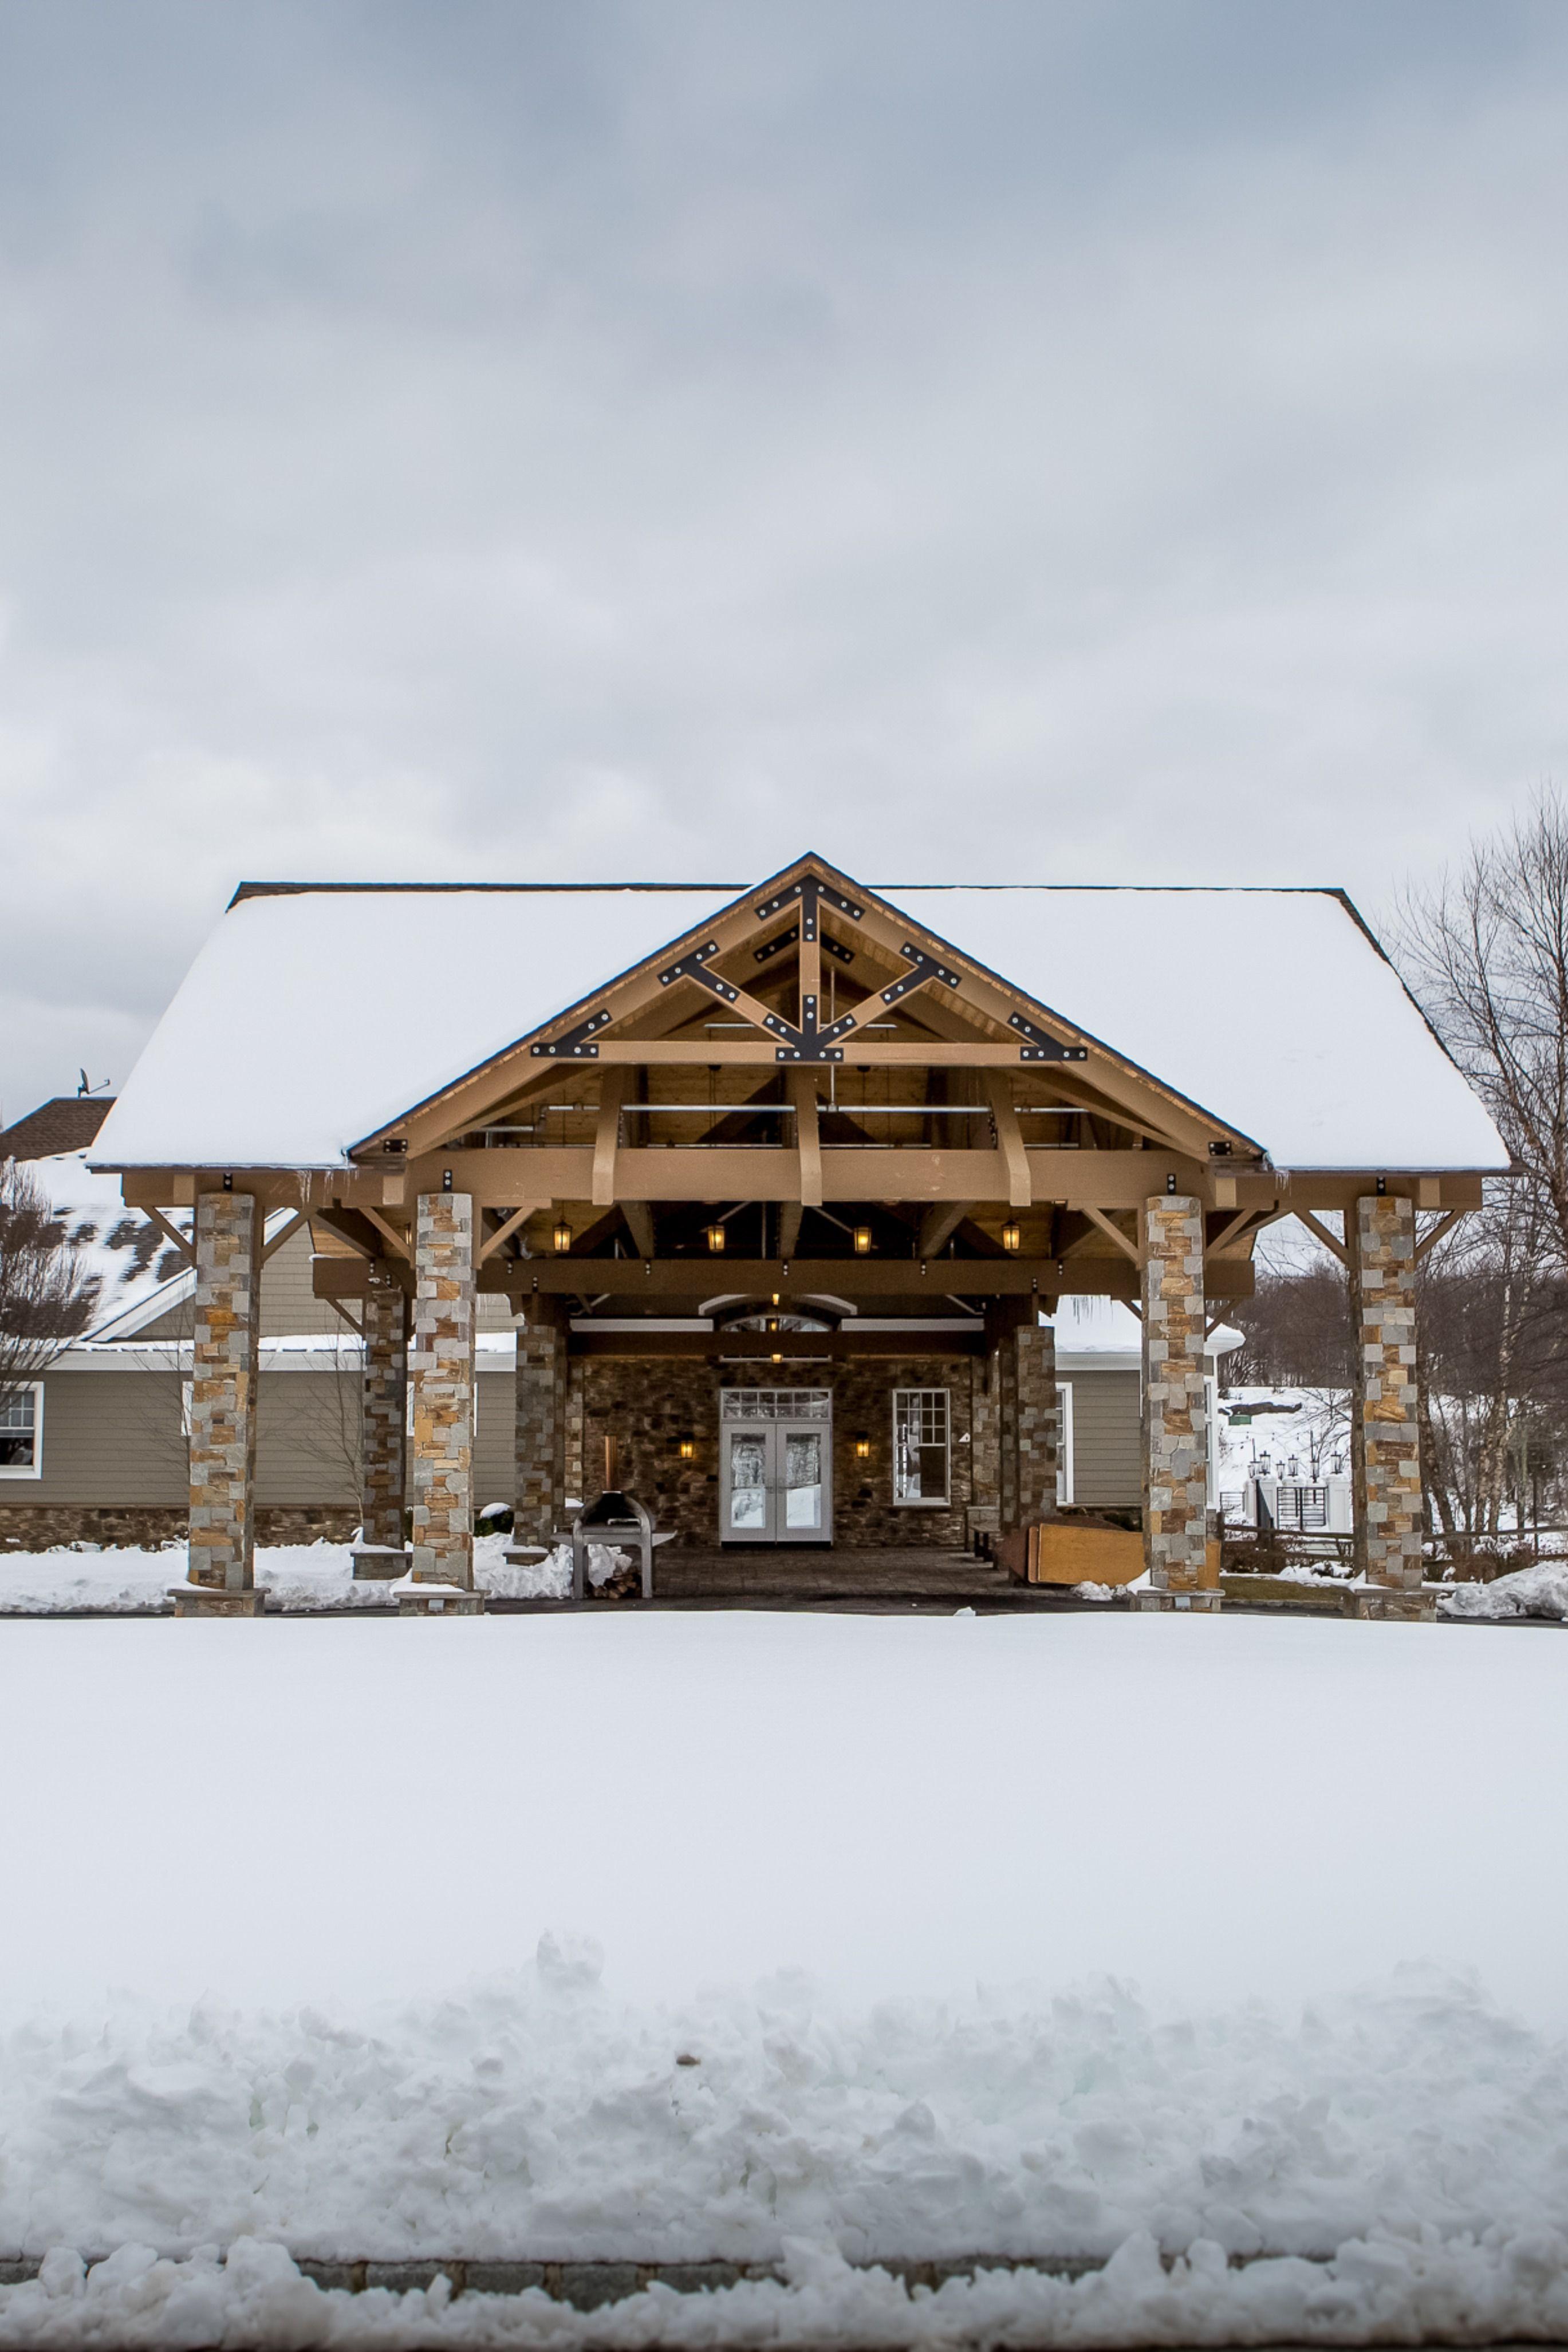 The carport at rustic wedding venue, Bear Brook Valley ...